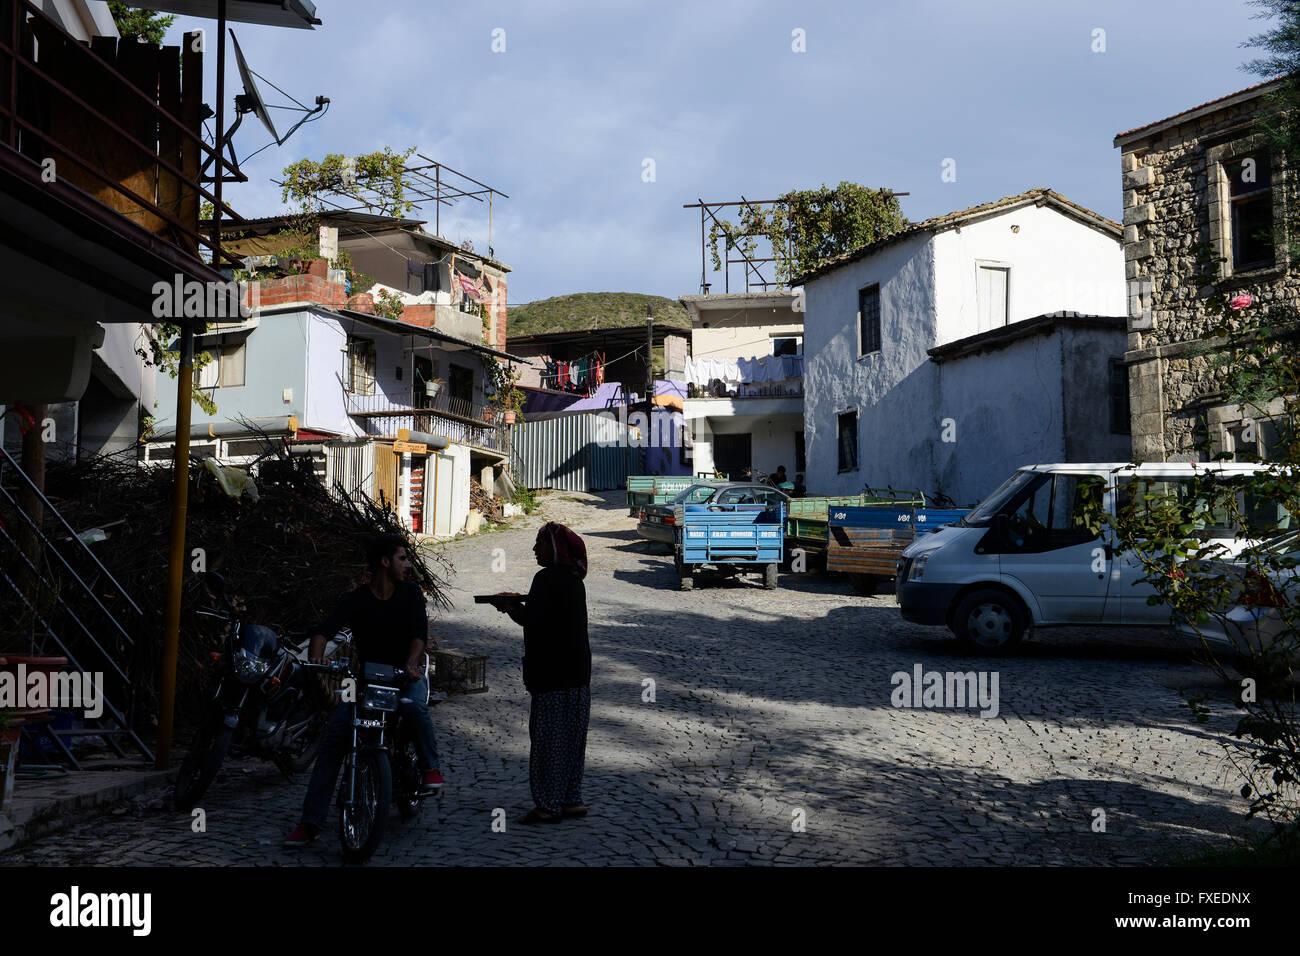 TURKEY Antakya, Musa Dagh, former armenian village Hidirbey, about 4000 armenian villagers fled during the genocide - Stock Image